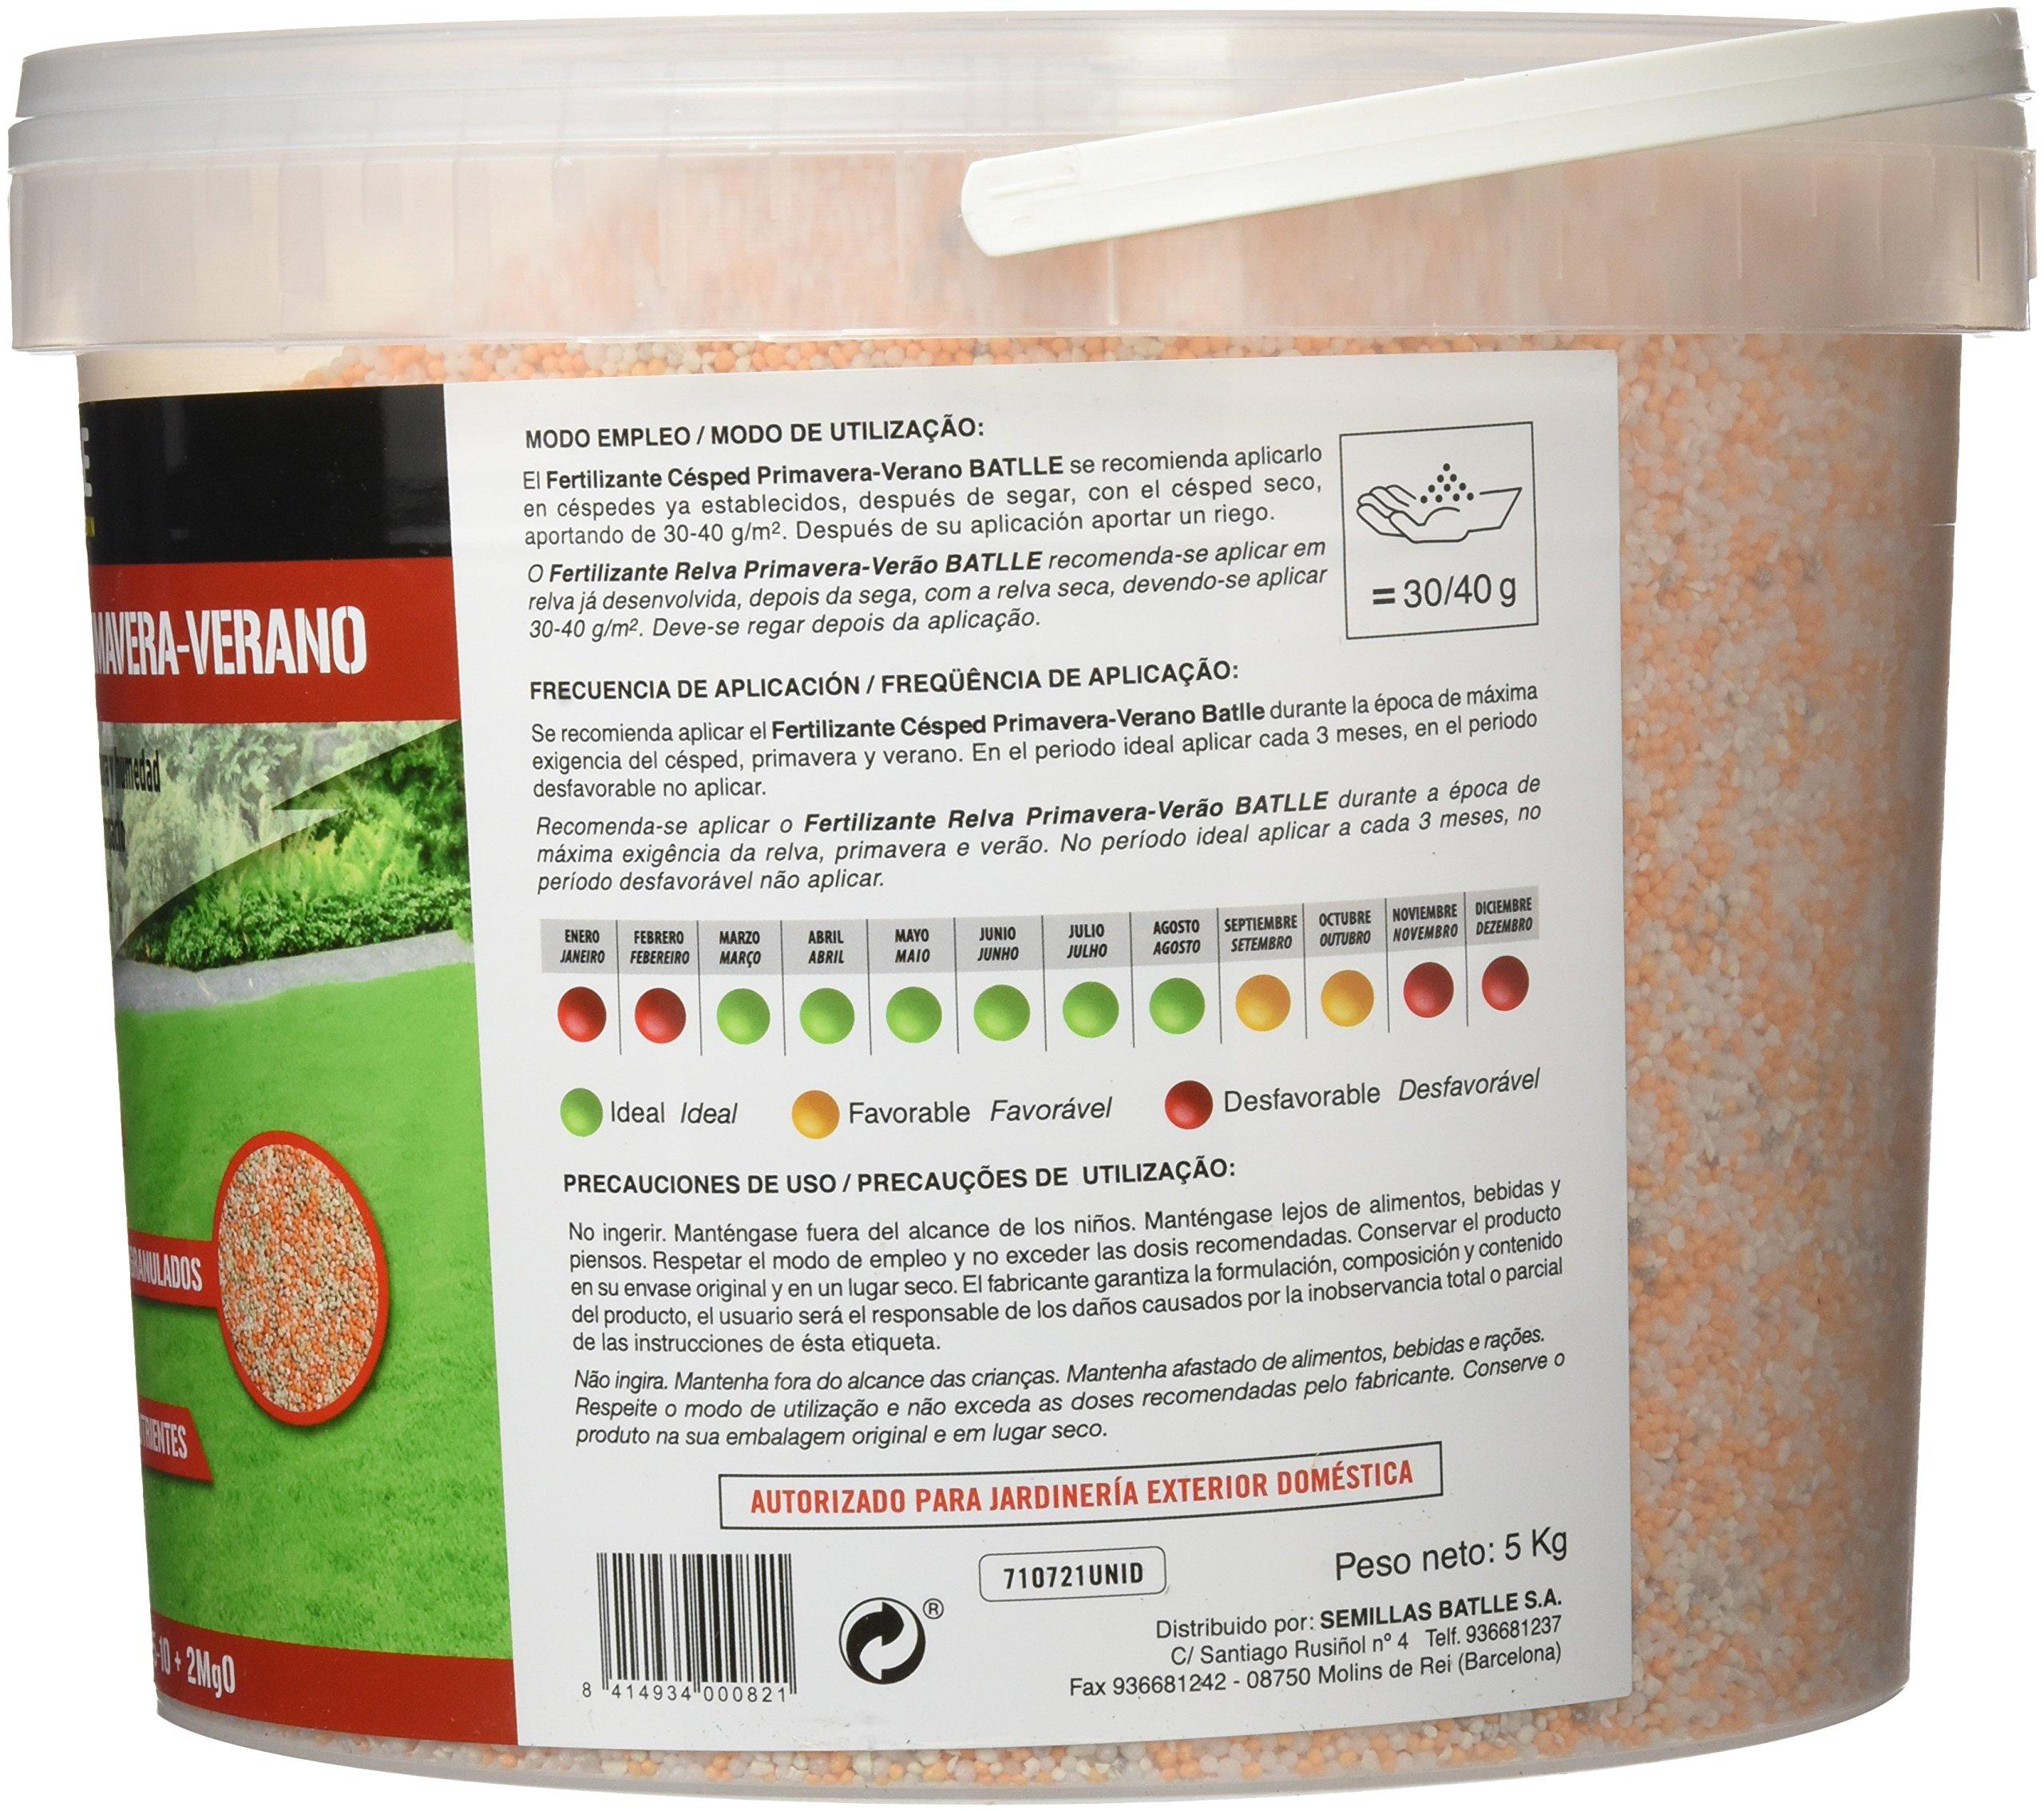 Amazon.es: Semillas Batlle: Fertilizantes Céspedes